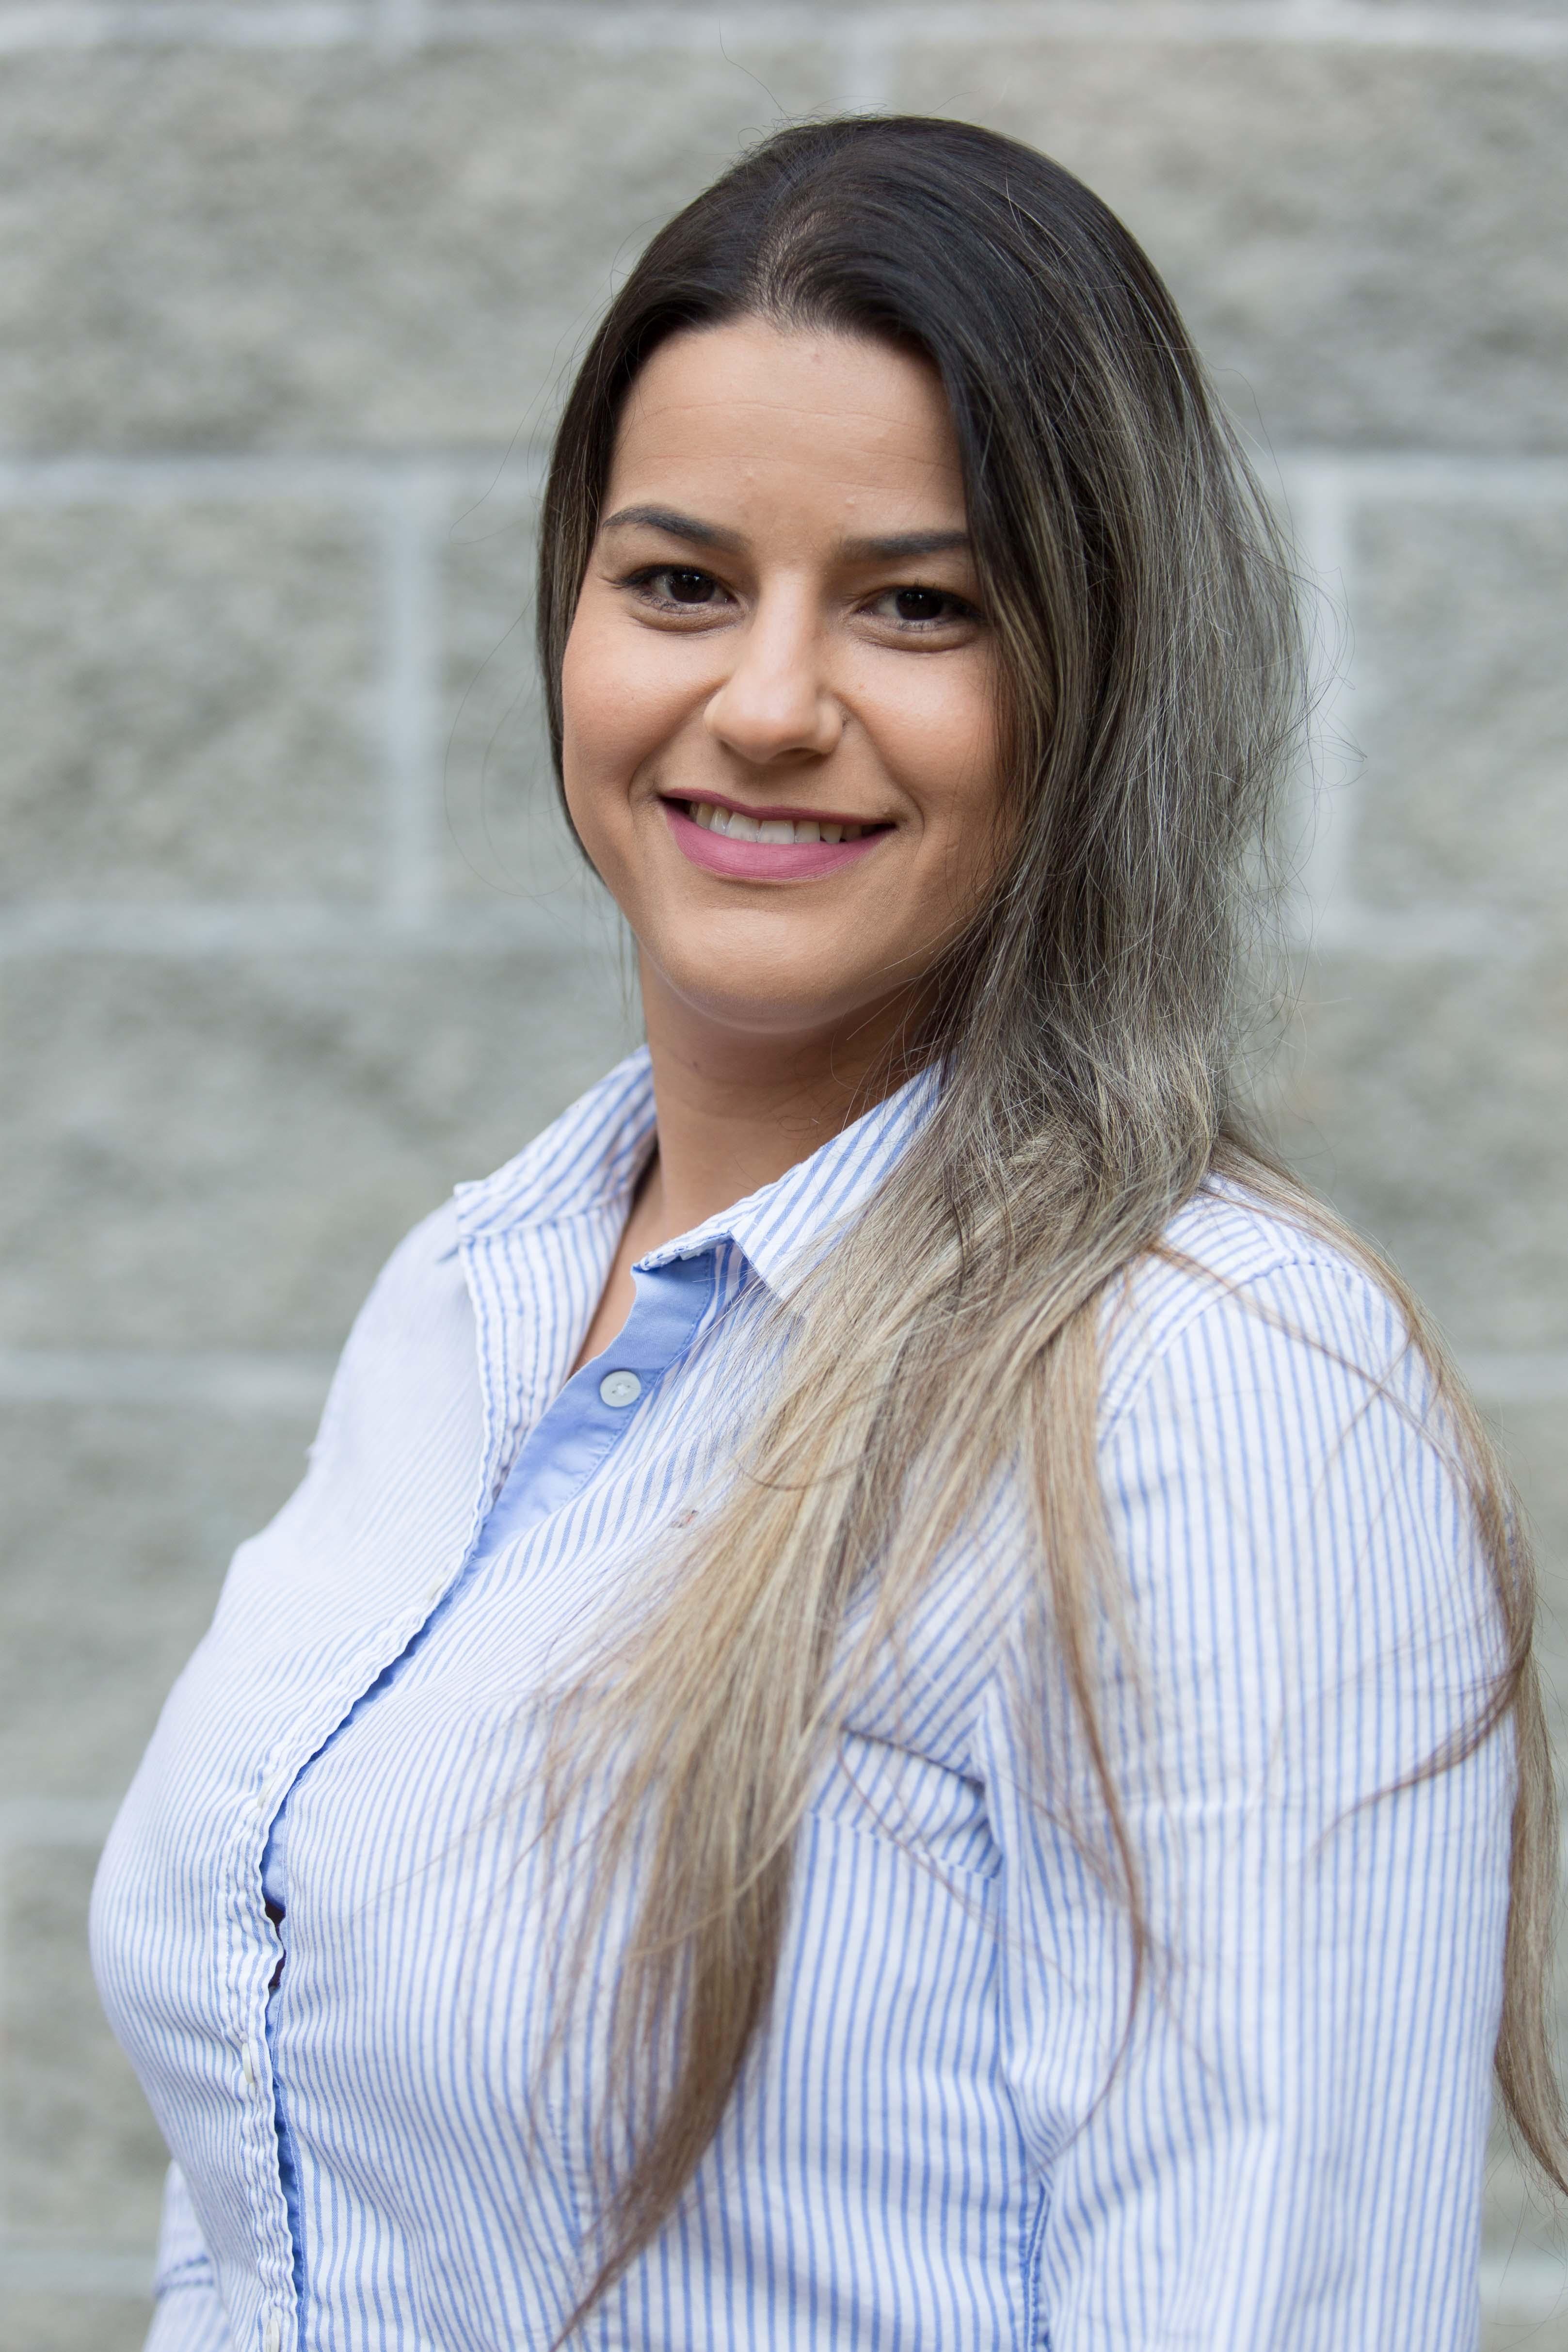 Daniela Pozo